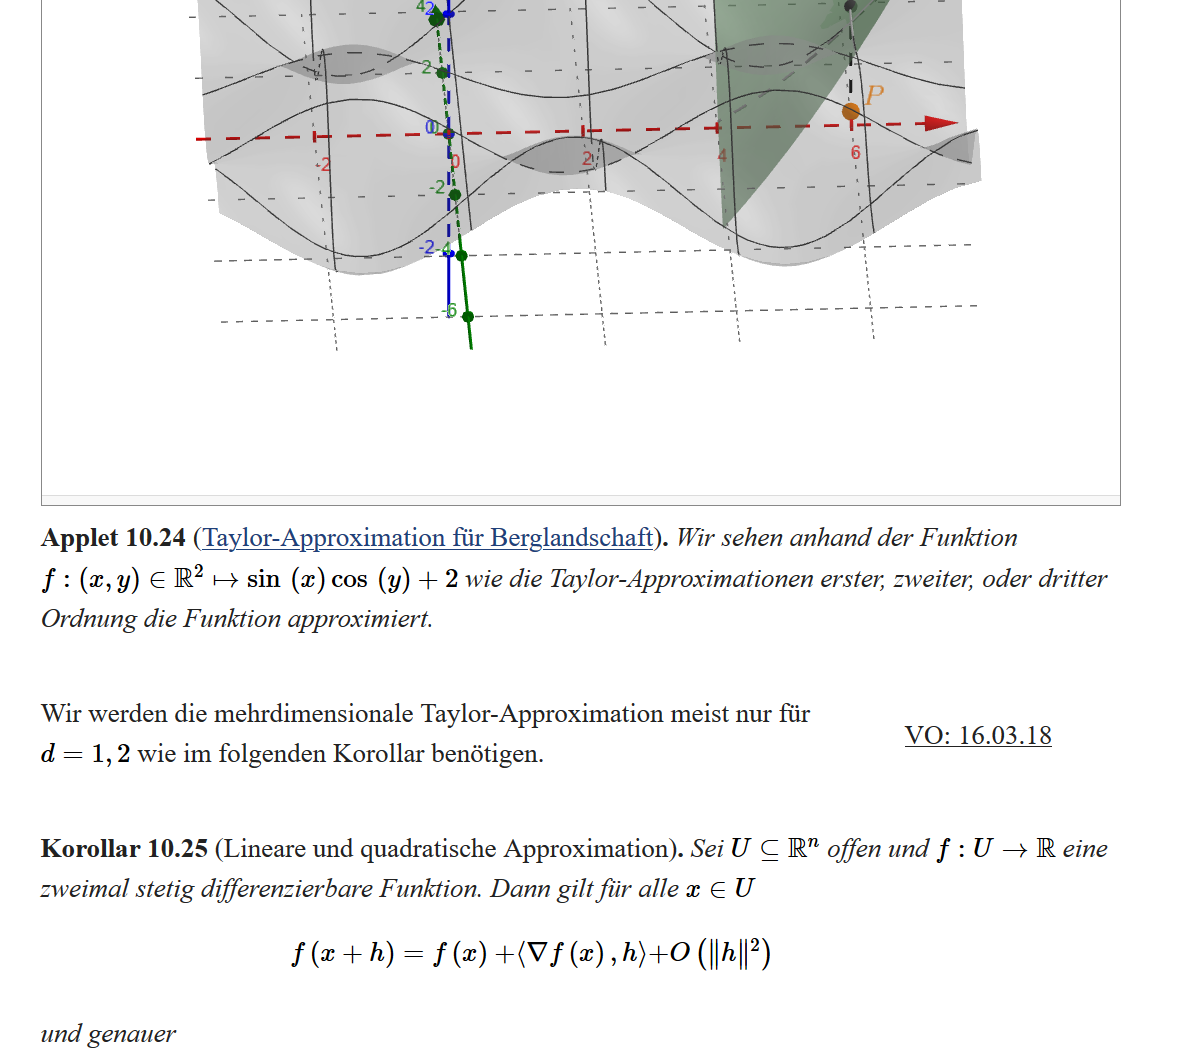 static/Screenshot_Pressbooks-01.png